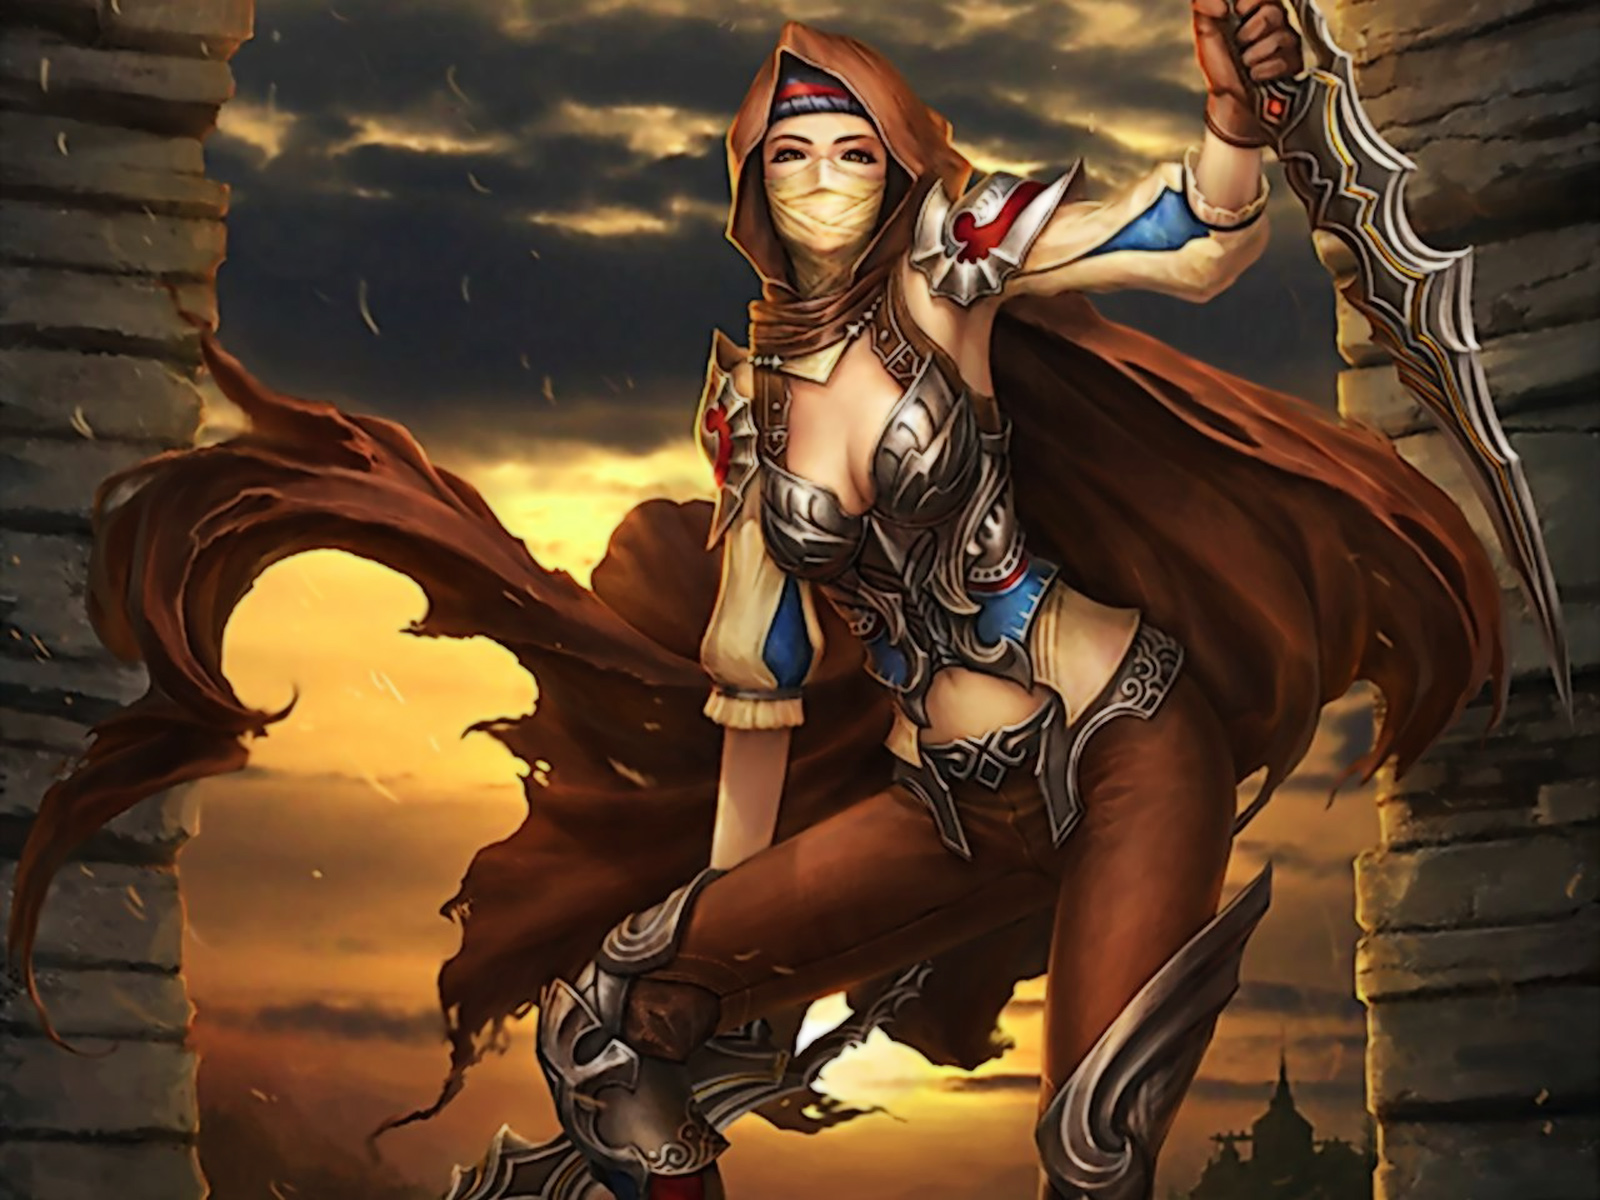 Hot Fantasy Women